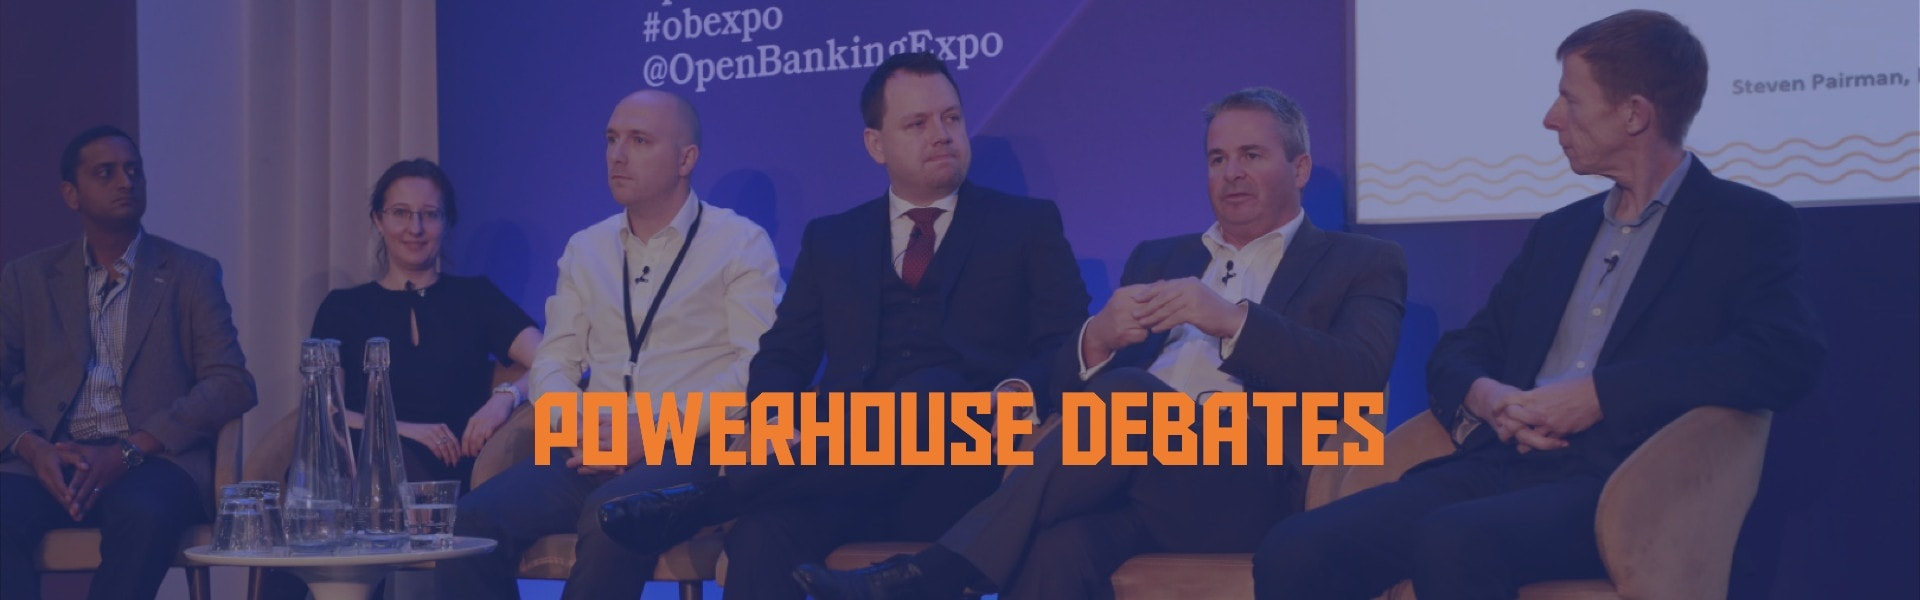 Powerhouse Debates